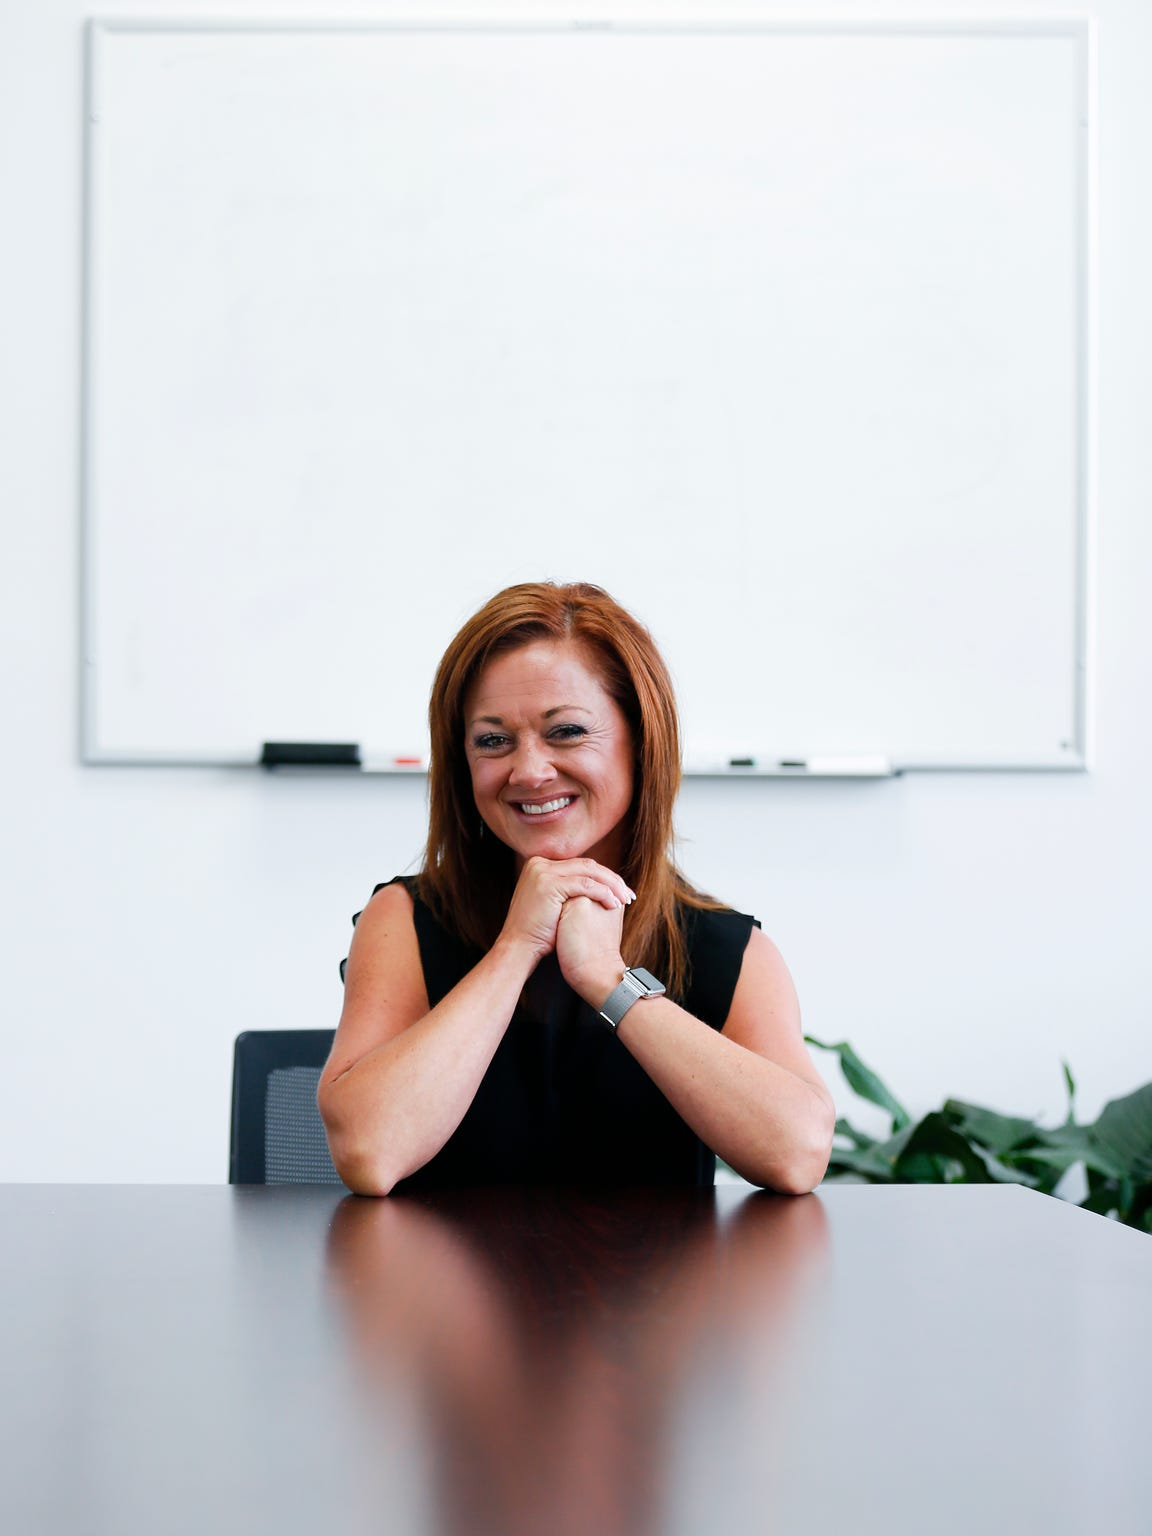 Melissa Daugherty works as a community mental health